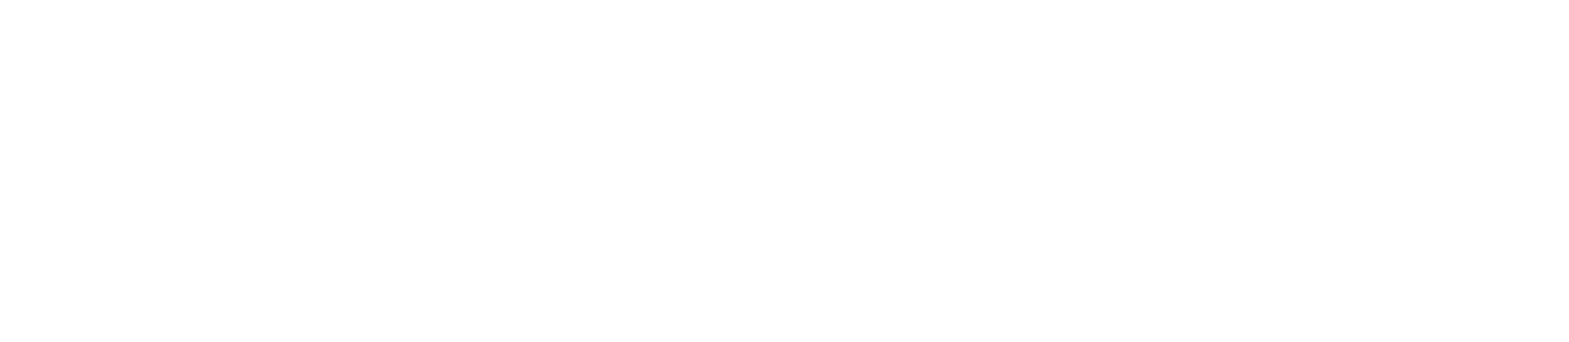 Canadian Utilities | Documents & Filings